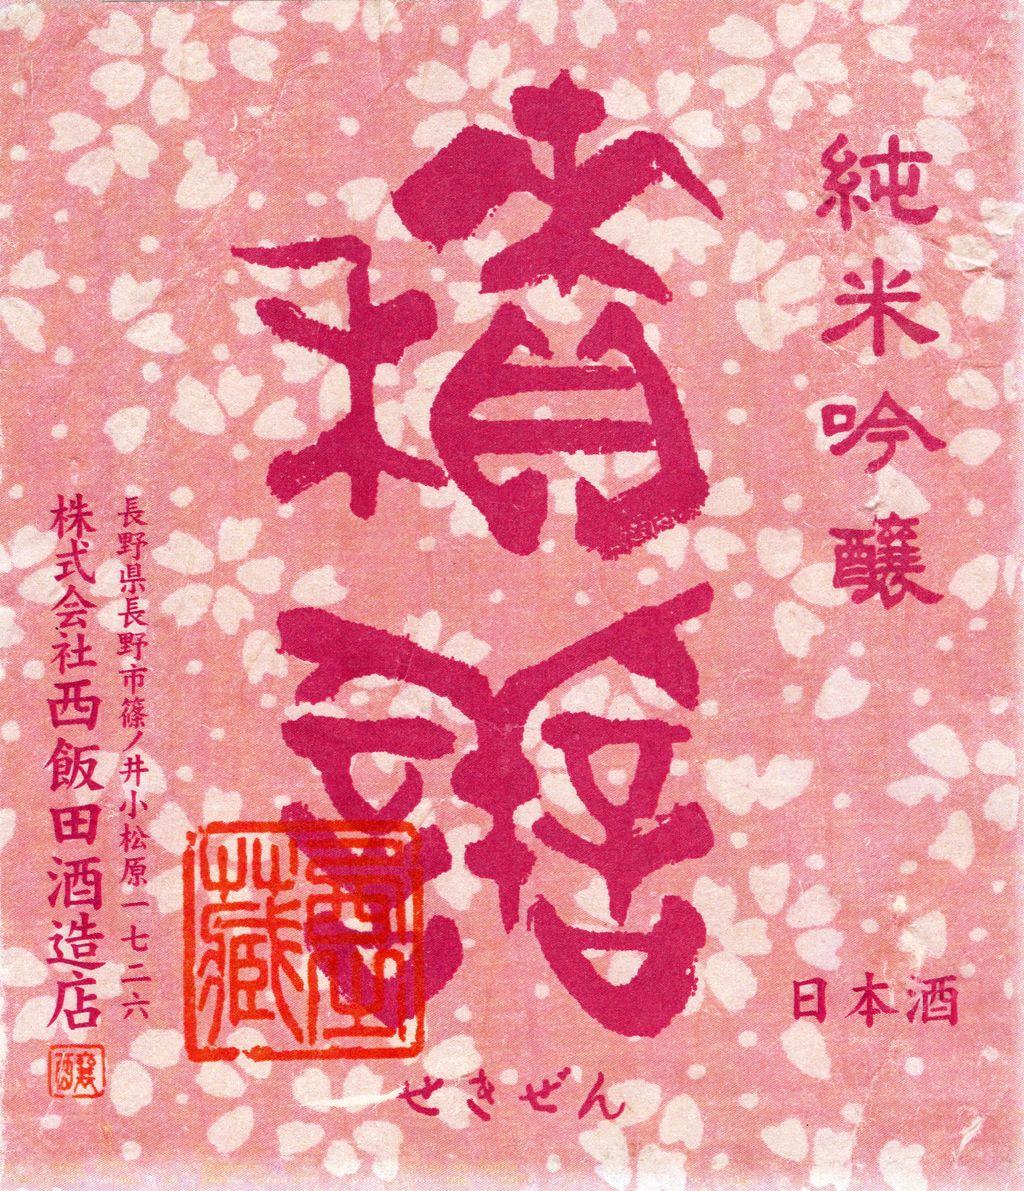 積善 桜の花酵母